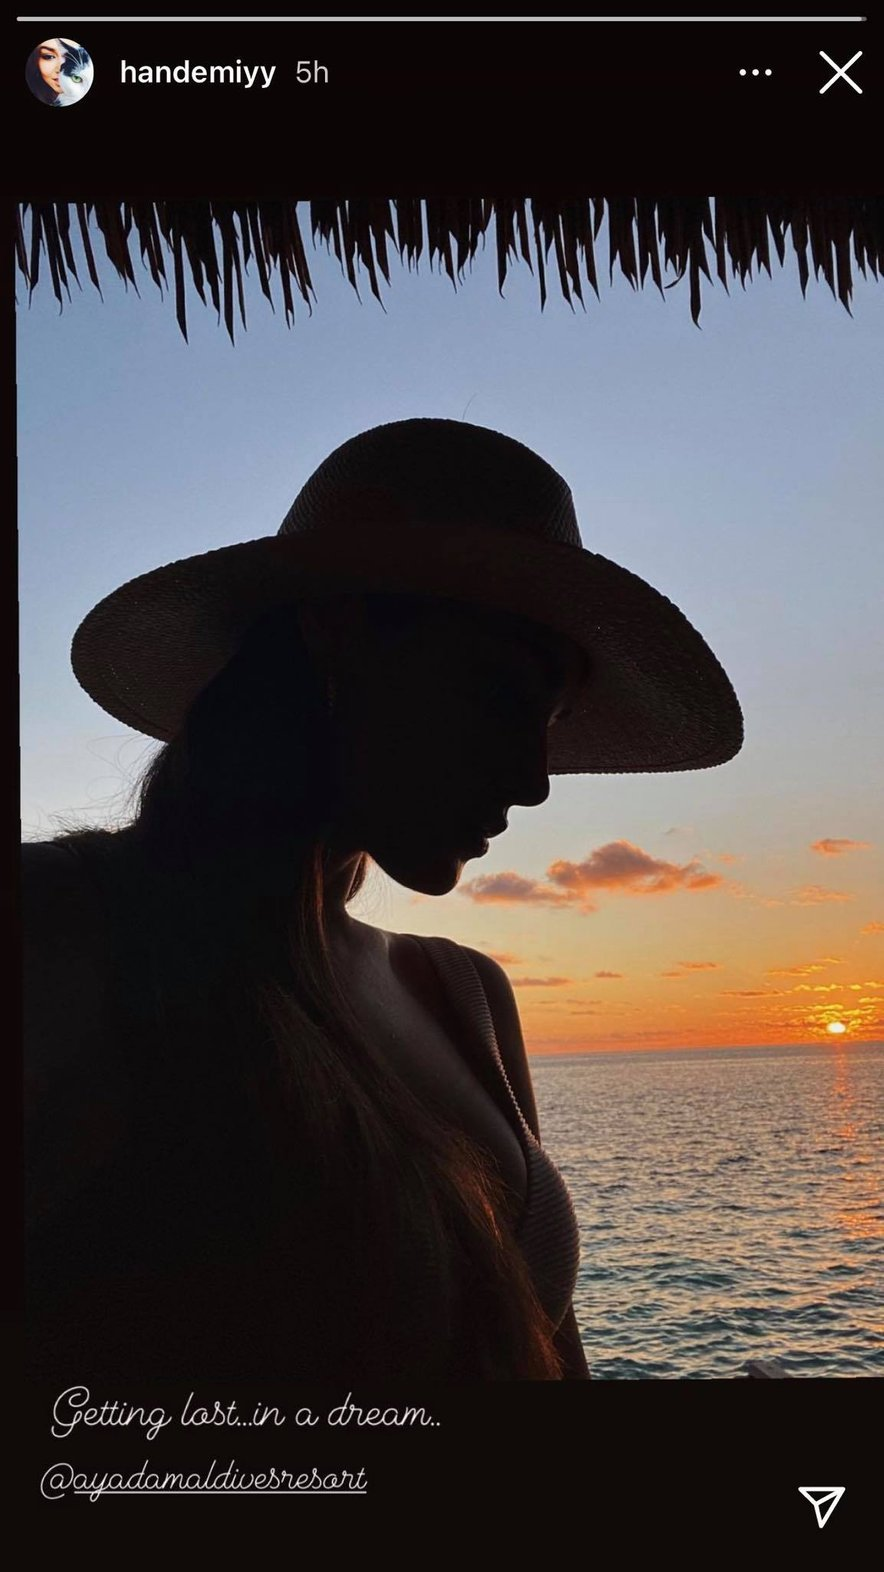 Hande Erçel trenutno počitnikuje na Maldivih.